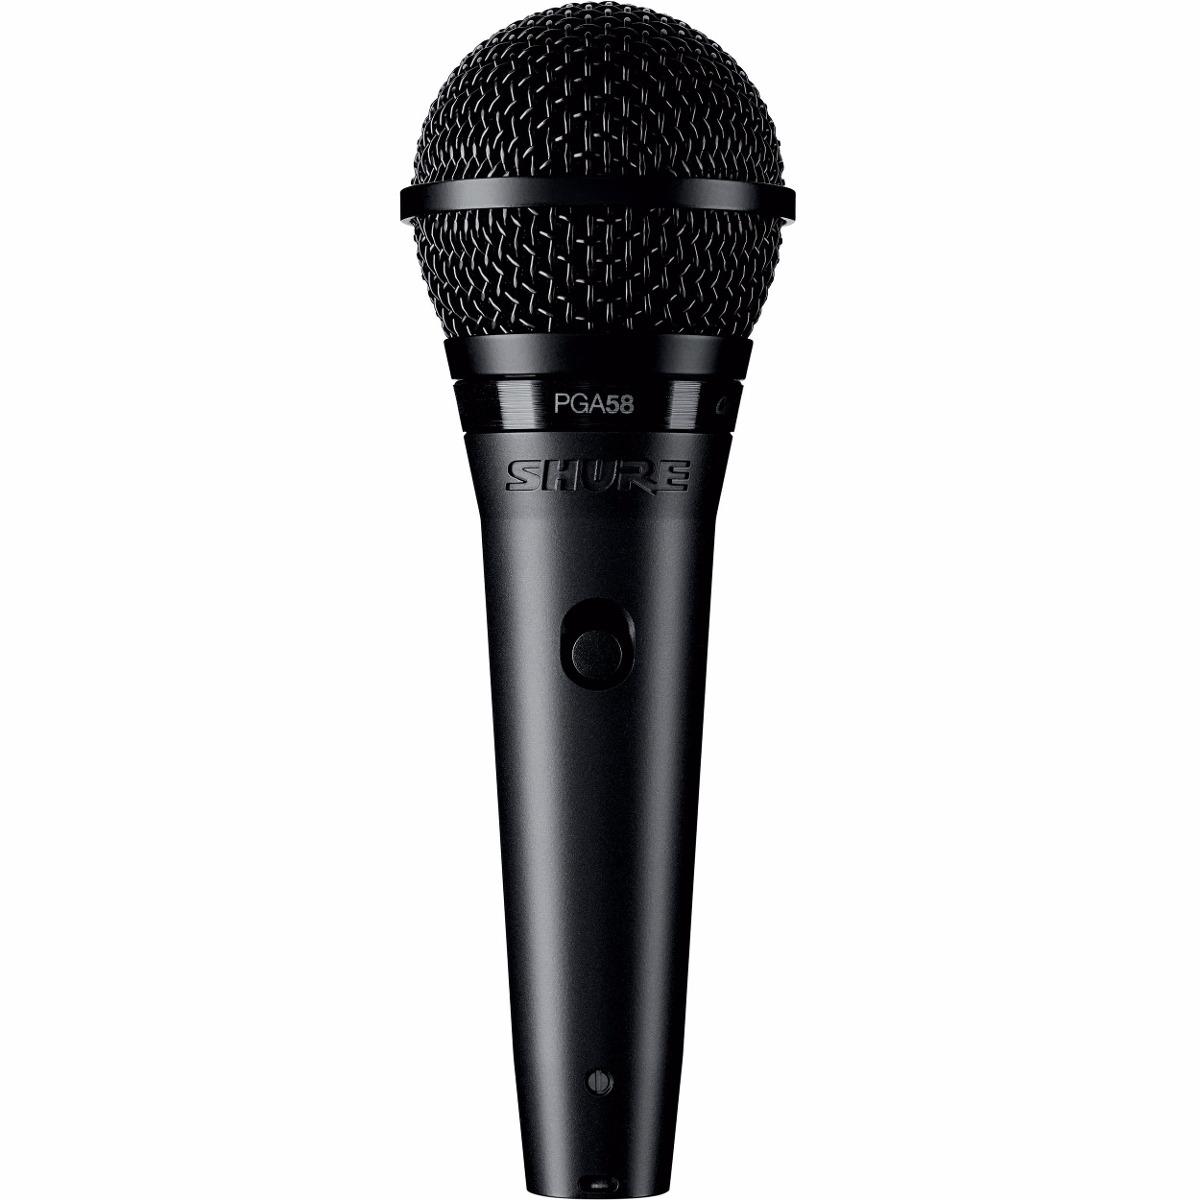 Micrófono Dinámico Cardiode Para Voces Shure Pga58 Xlr